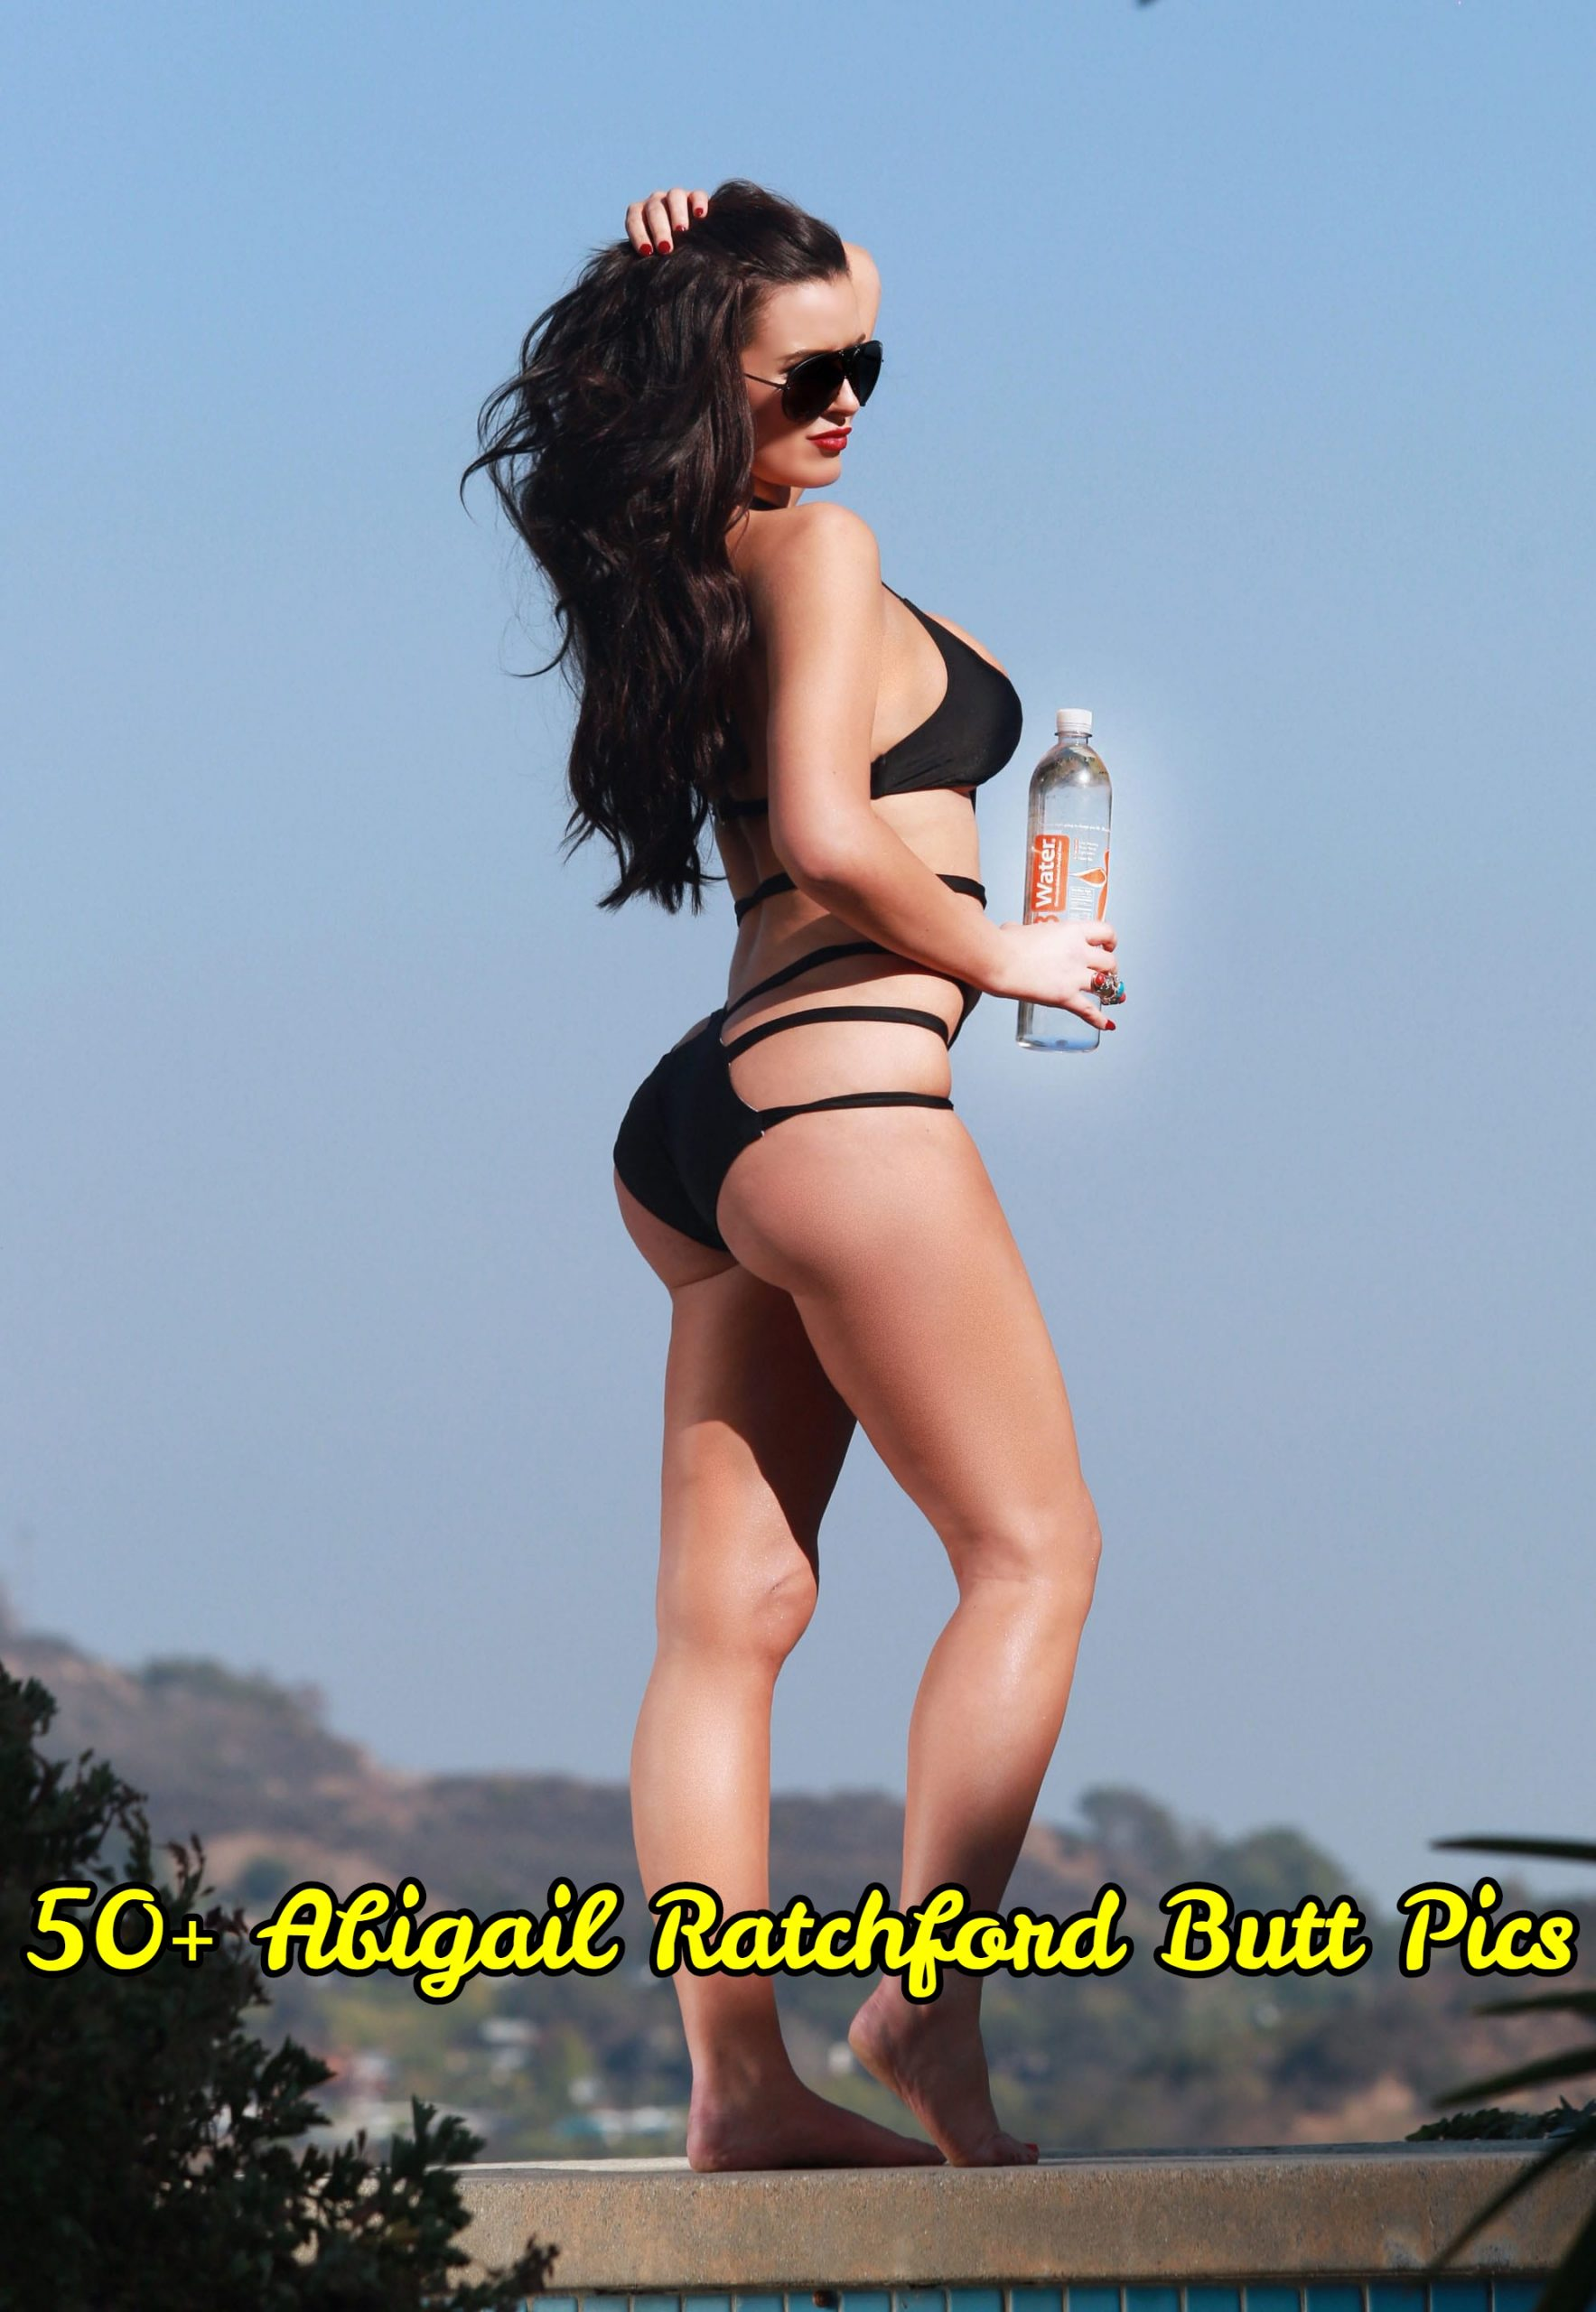 Abigail Ratchford butt pics.